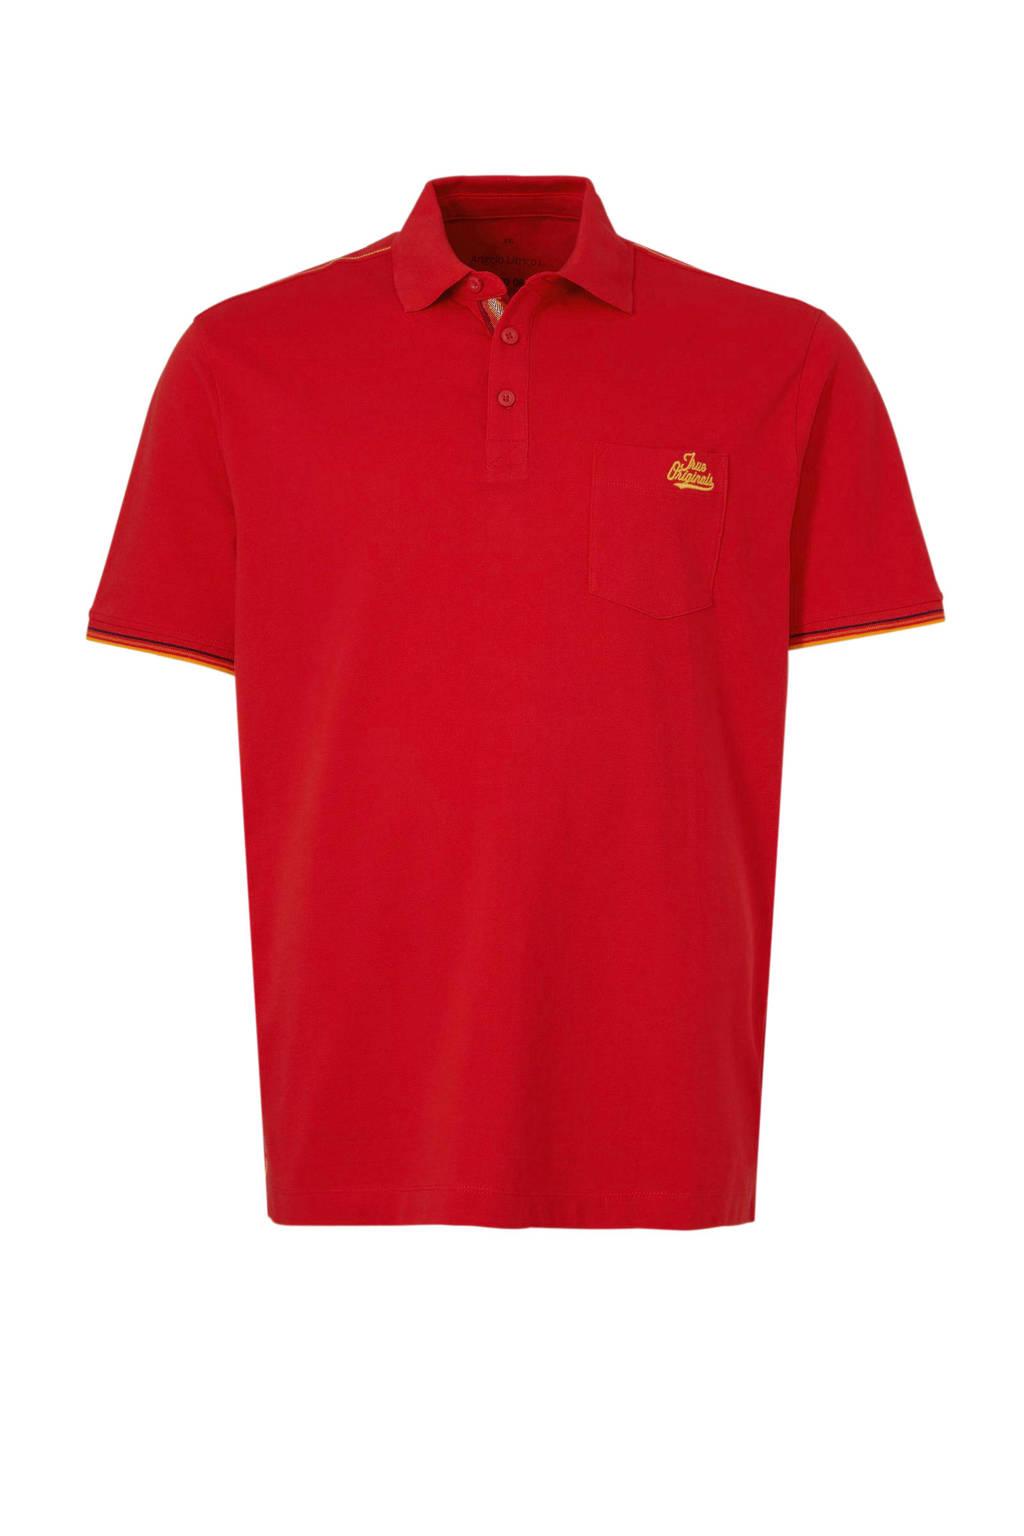 C&A XL Angelo Litrico polo rood, Rood